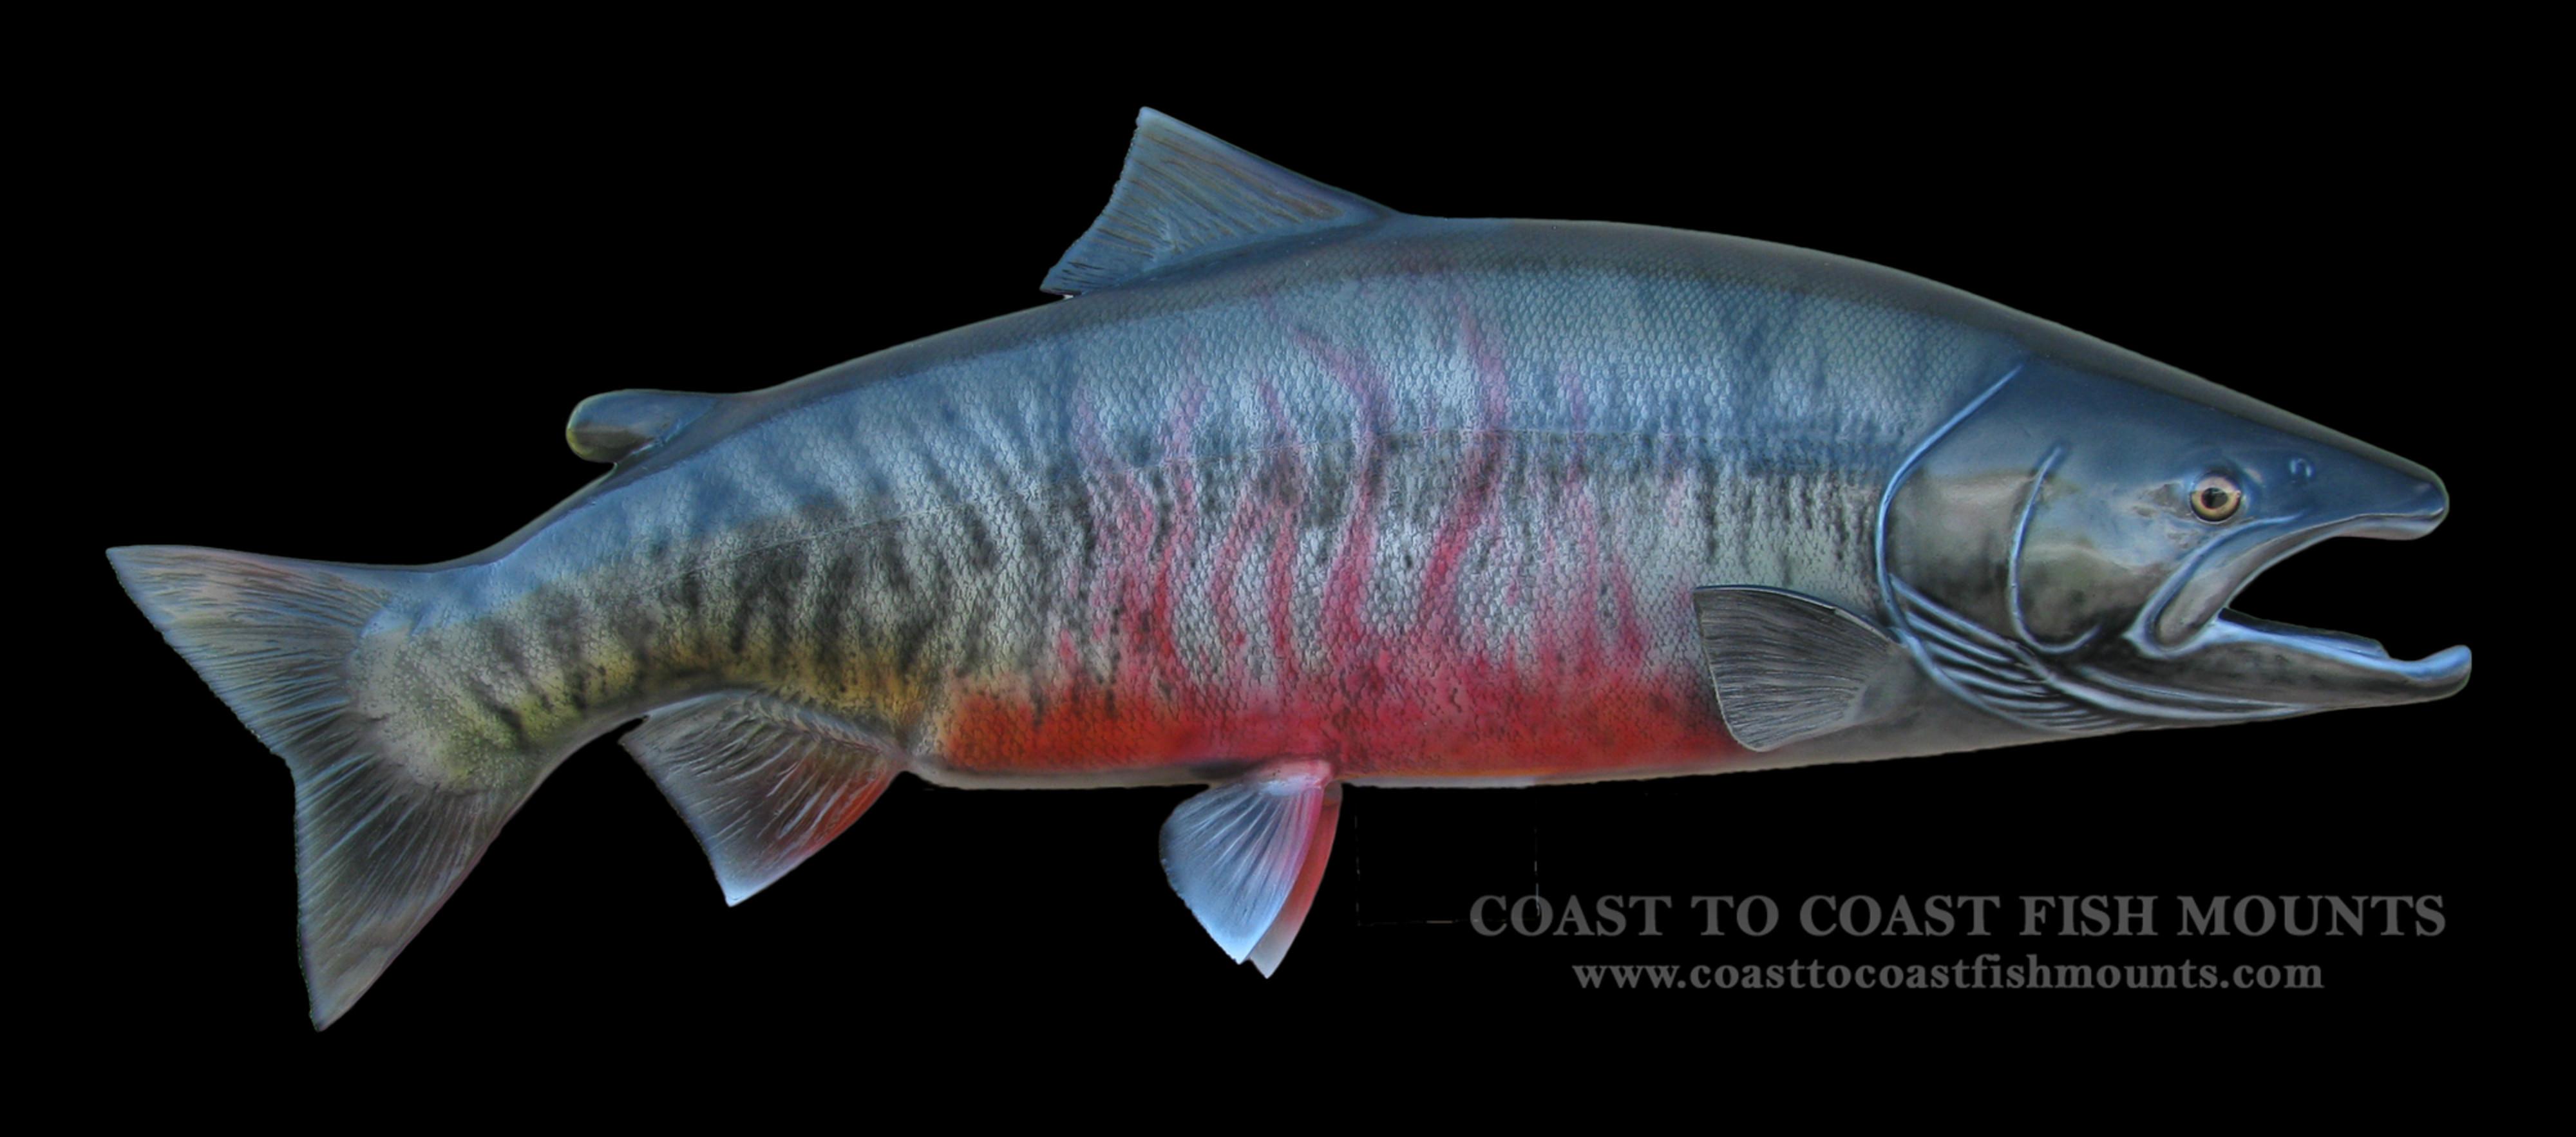 Chum salmon fish mount and fish replicas coast to coast for Replica fish mounts